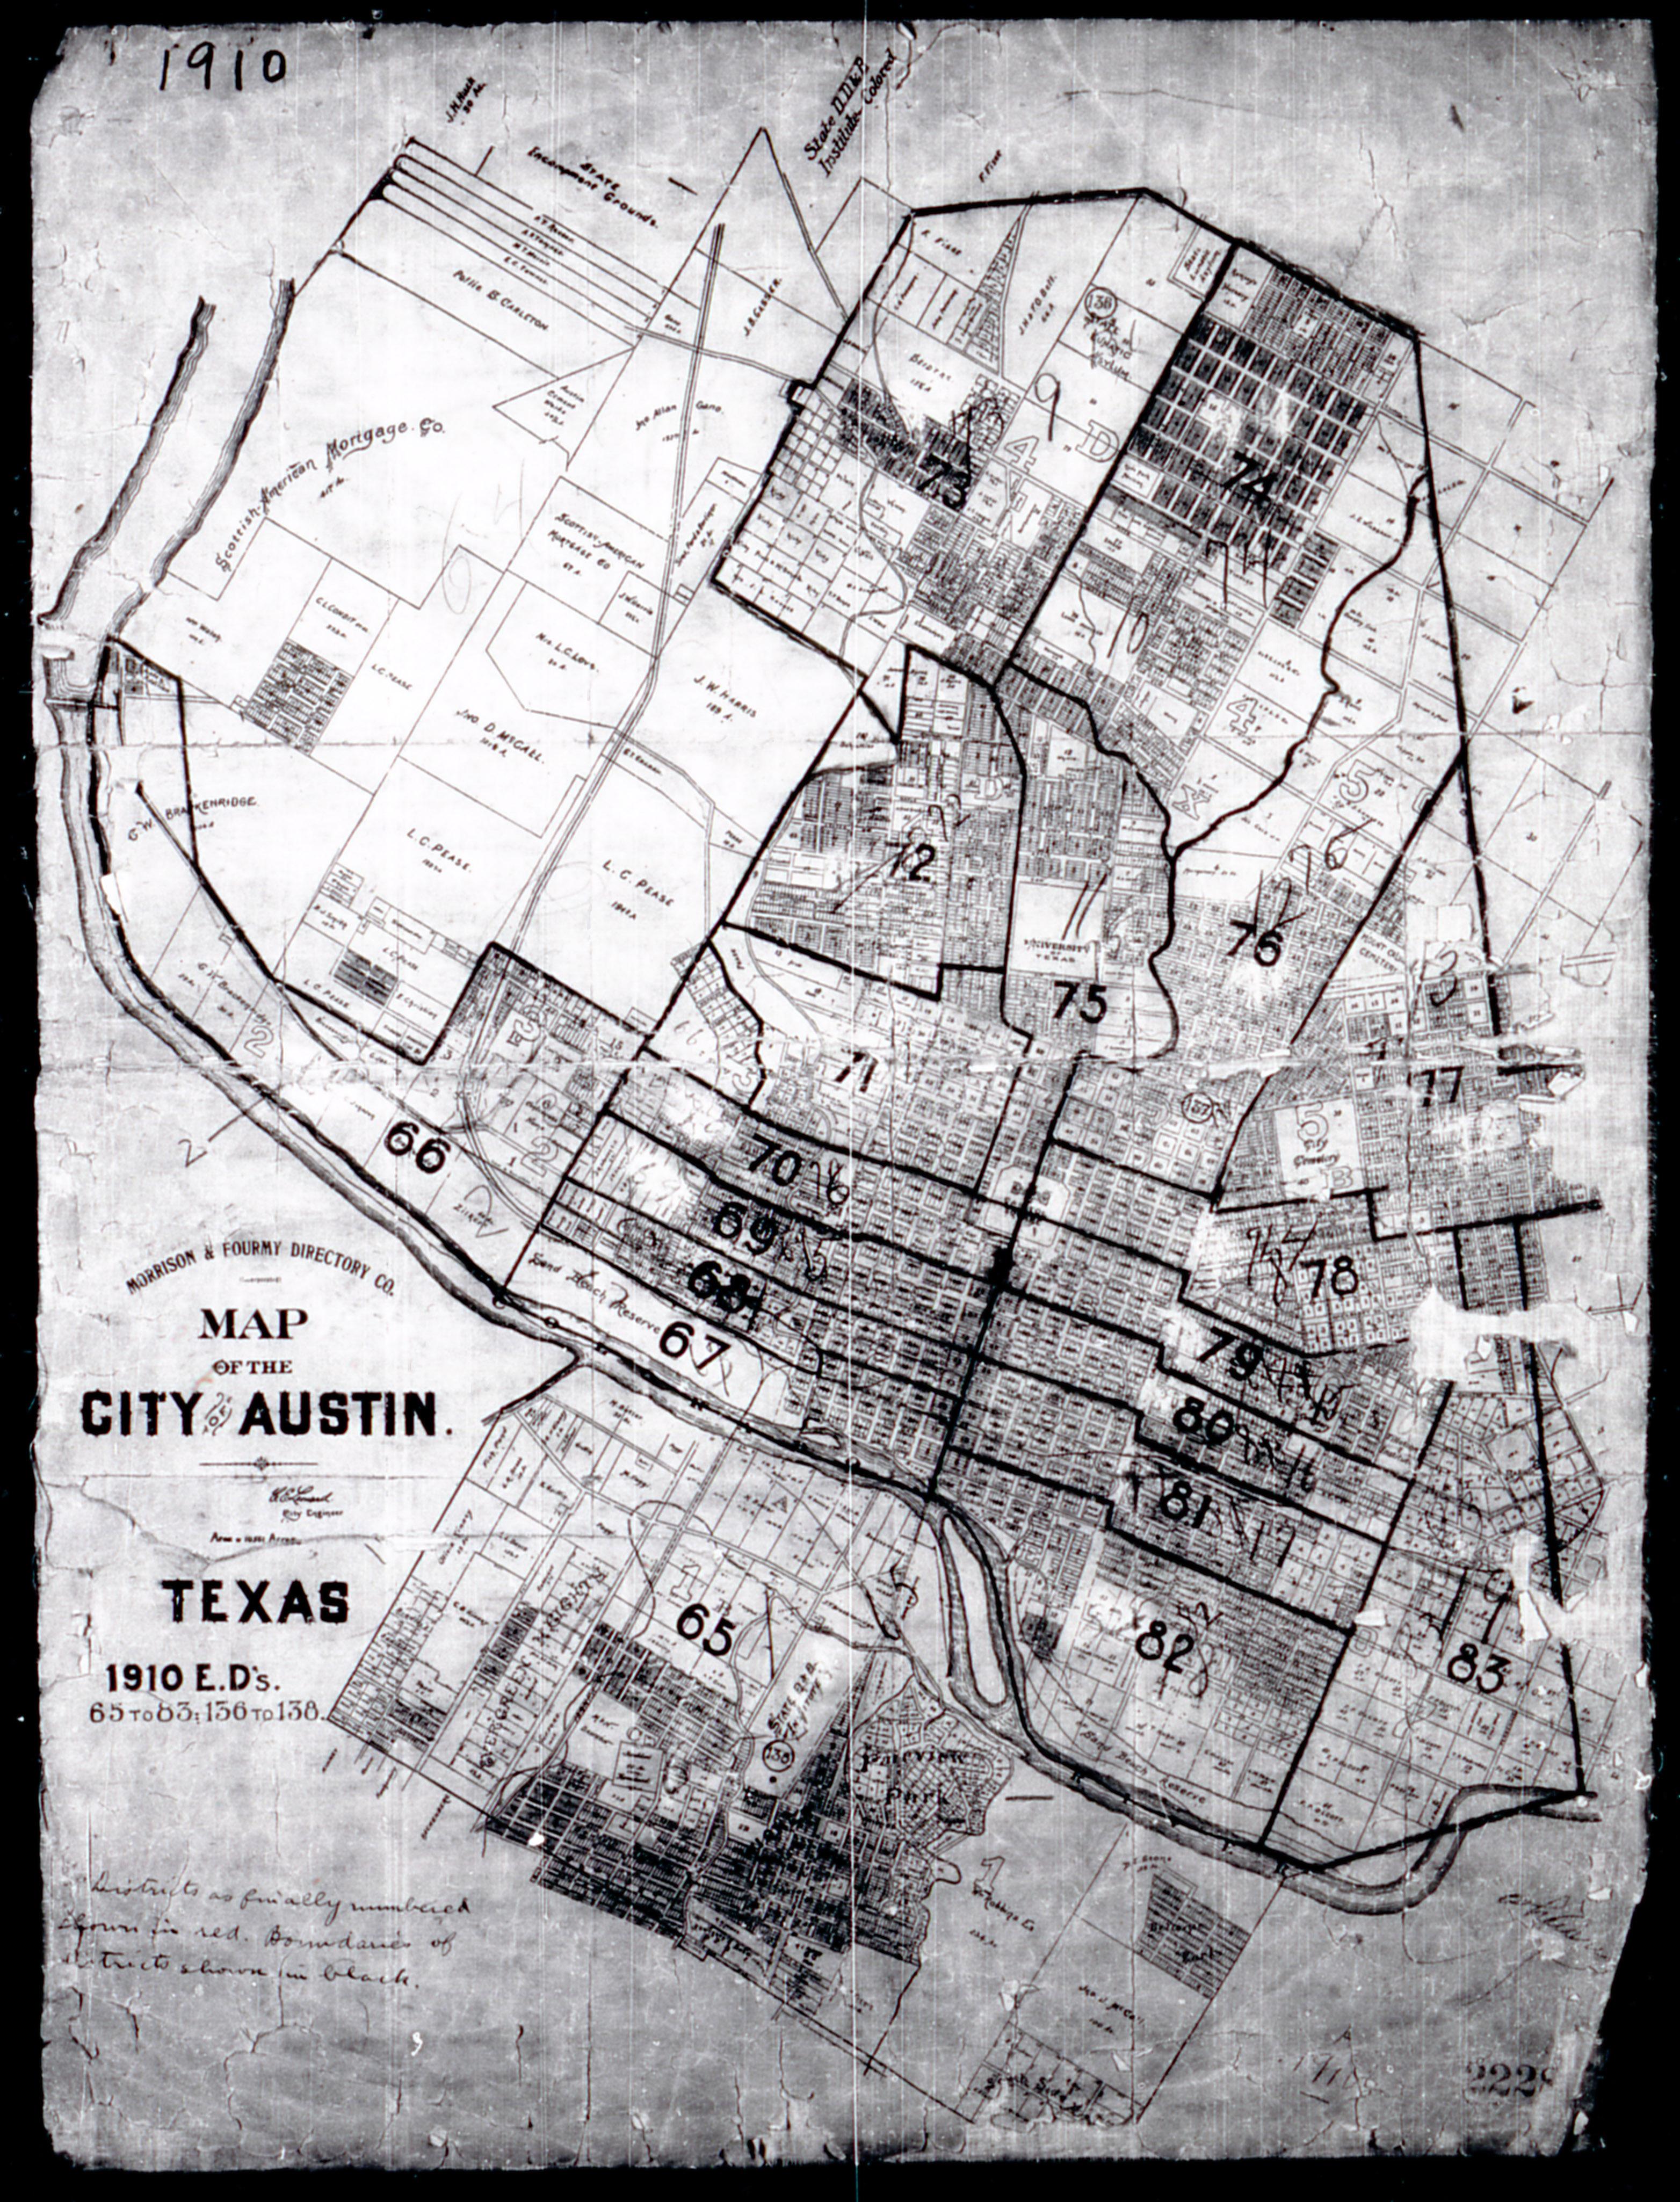 1910 City of Austin map